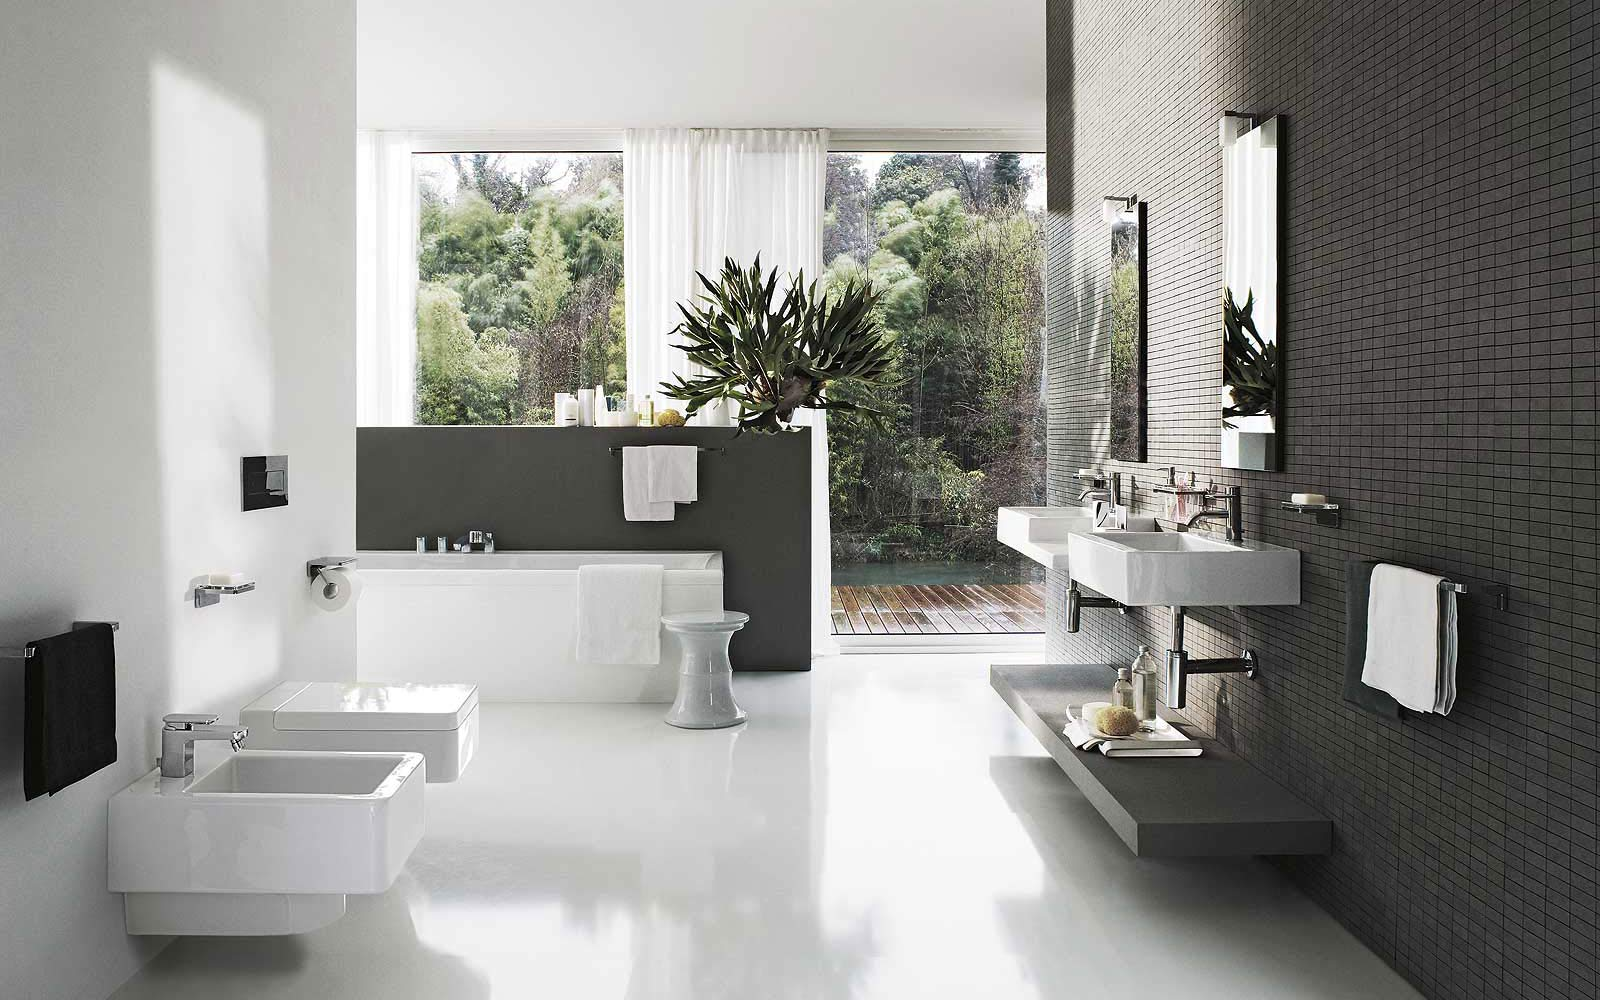 Salle bain complete for Prix salle de bain complete